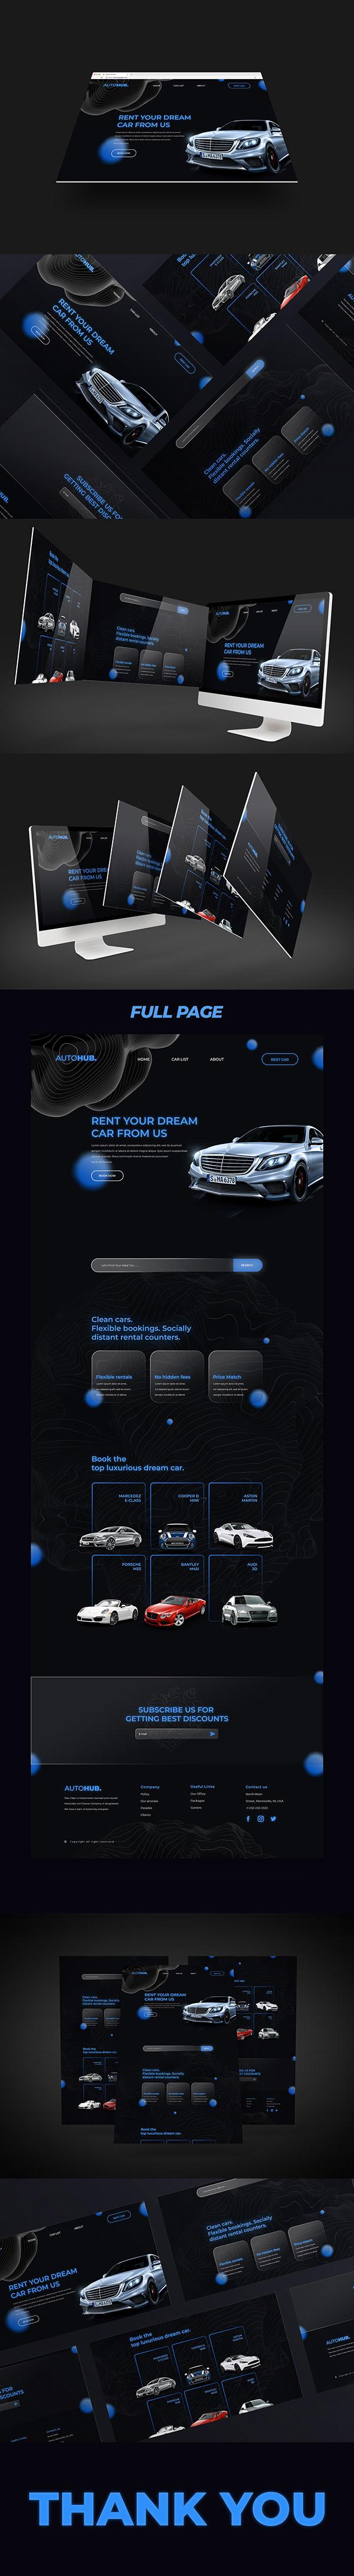 AUTOHUB - Website Design